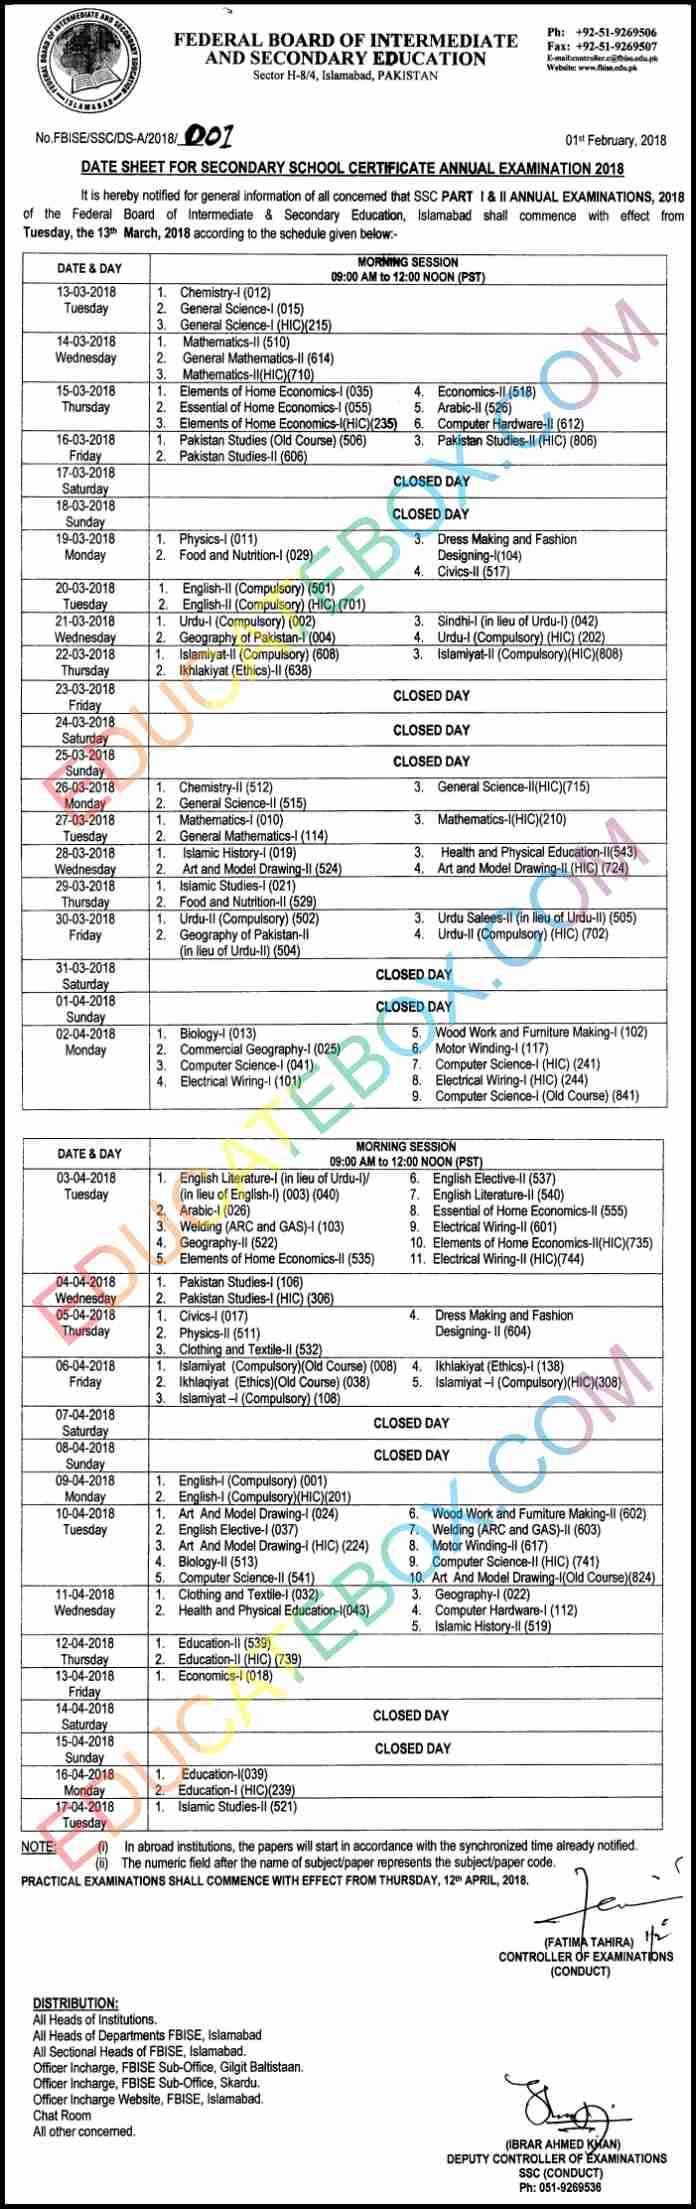 9th 10th Date Sheet 2018 Federal Board Fbise Islamabad Electrical Wiring Book Urdu Related